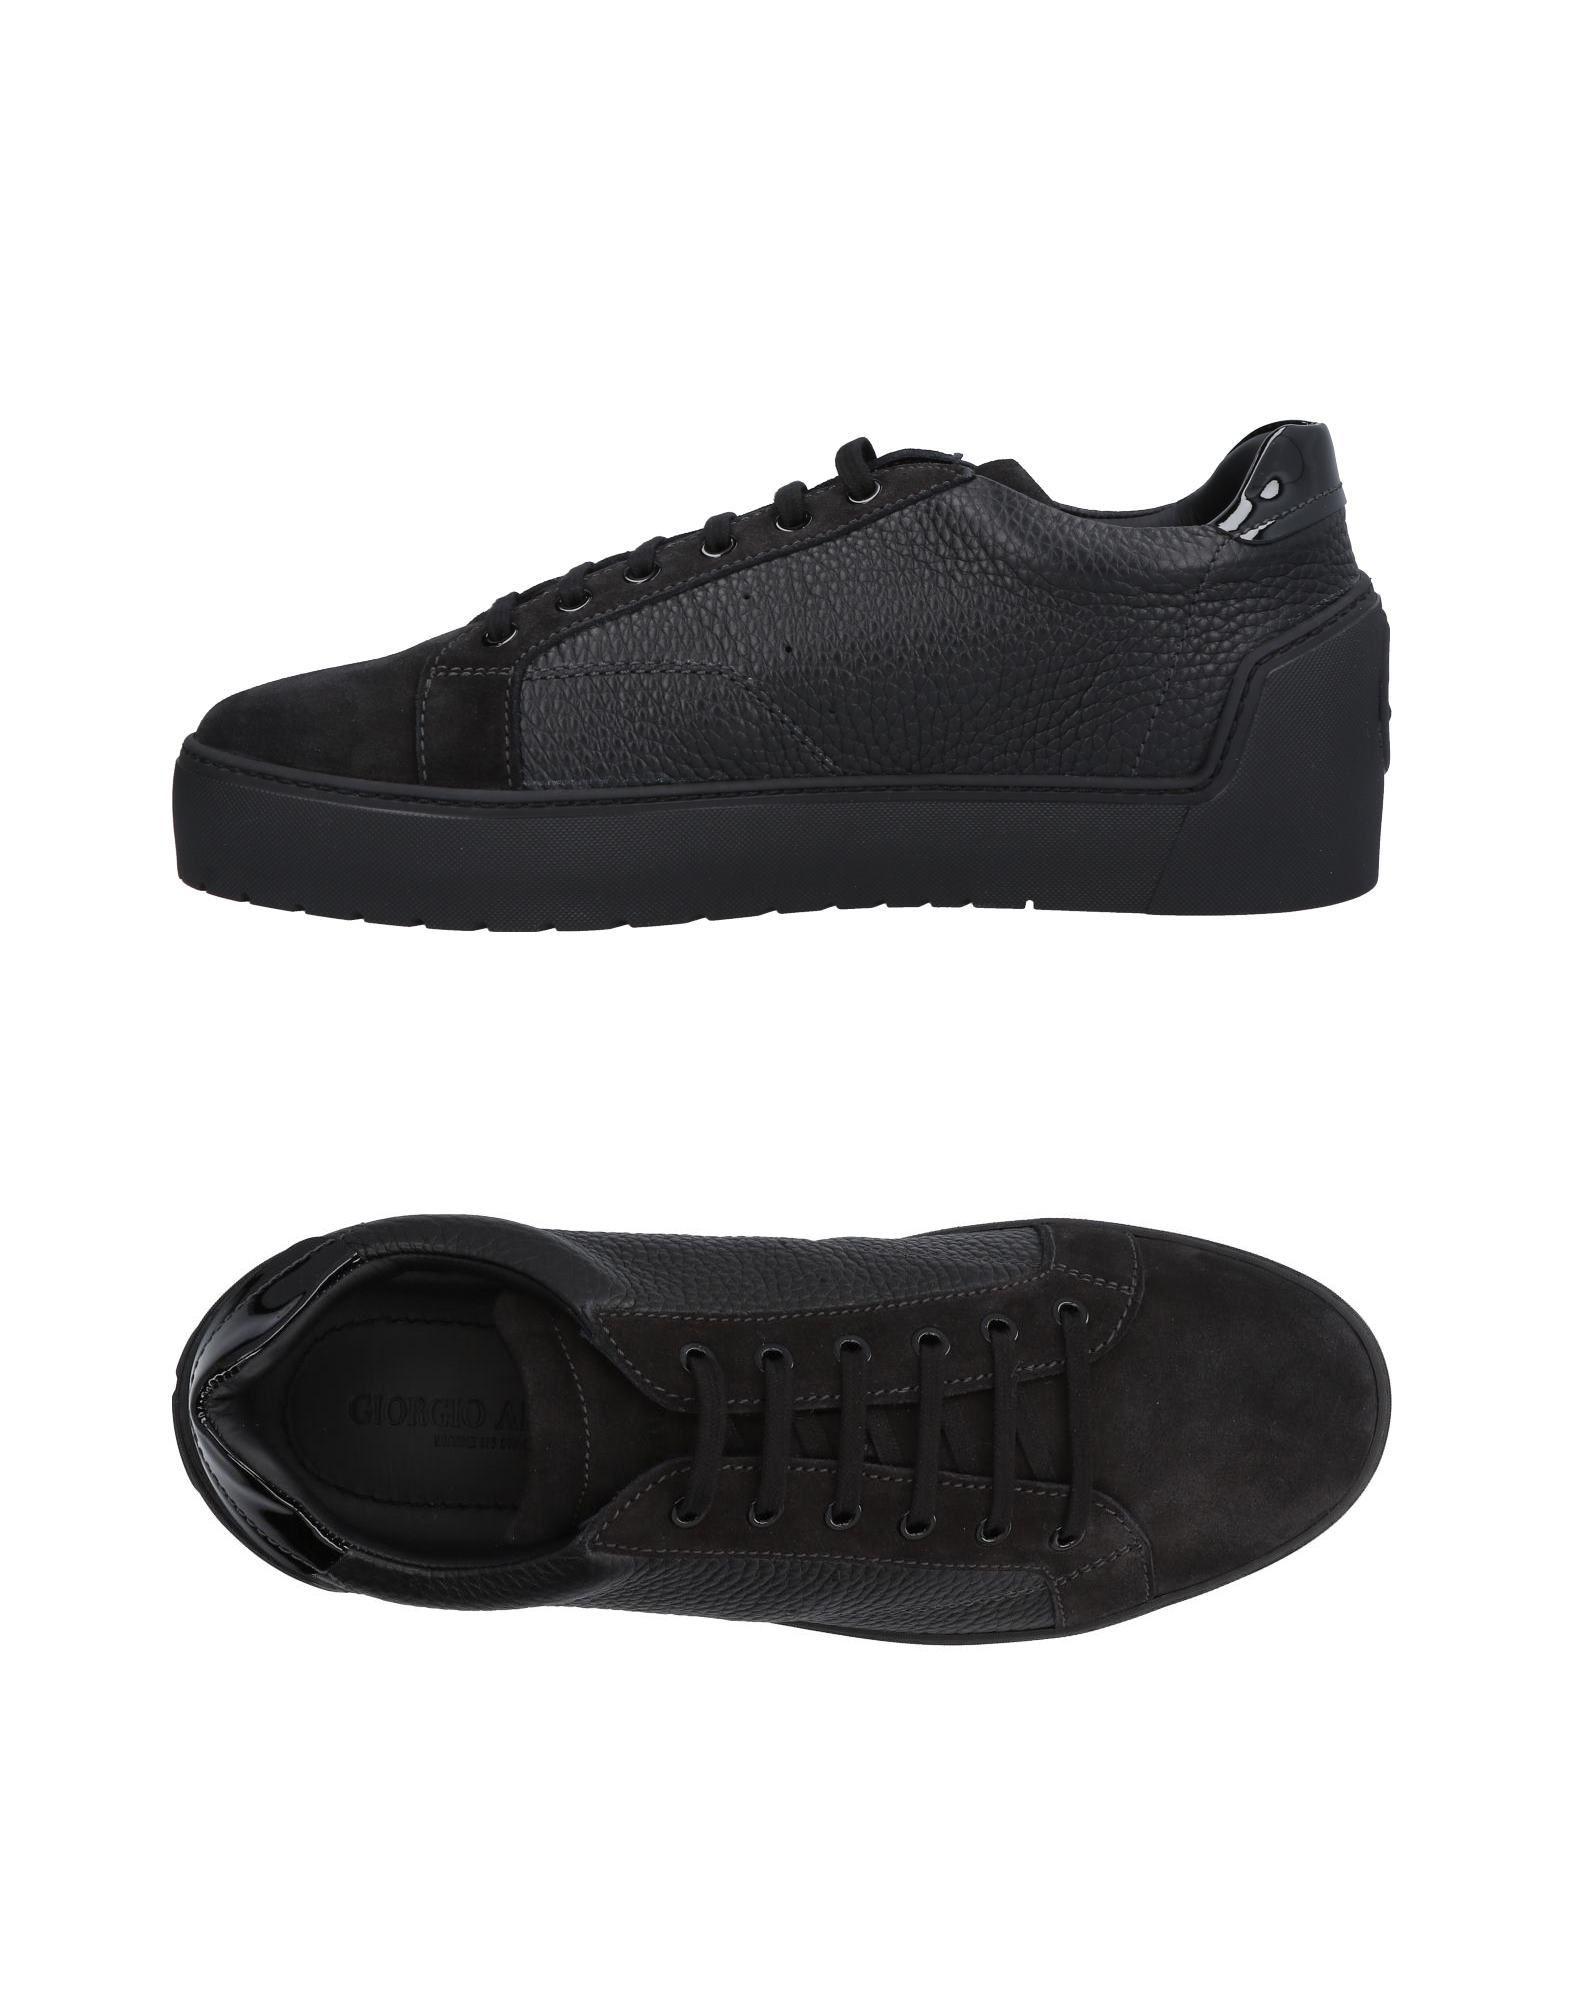 Sneakers Giorgio Armani Homme - Sneakers Giorgio Armani  Noir Dédouanement saisonnier